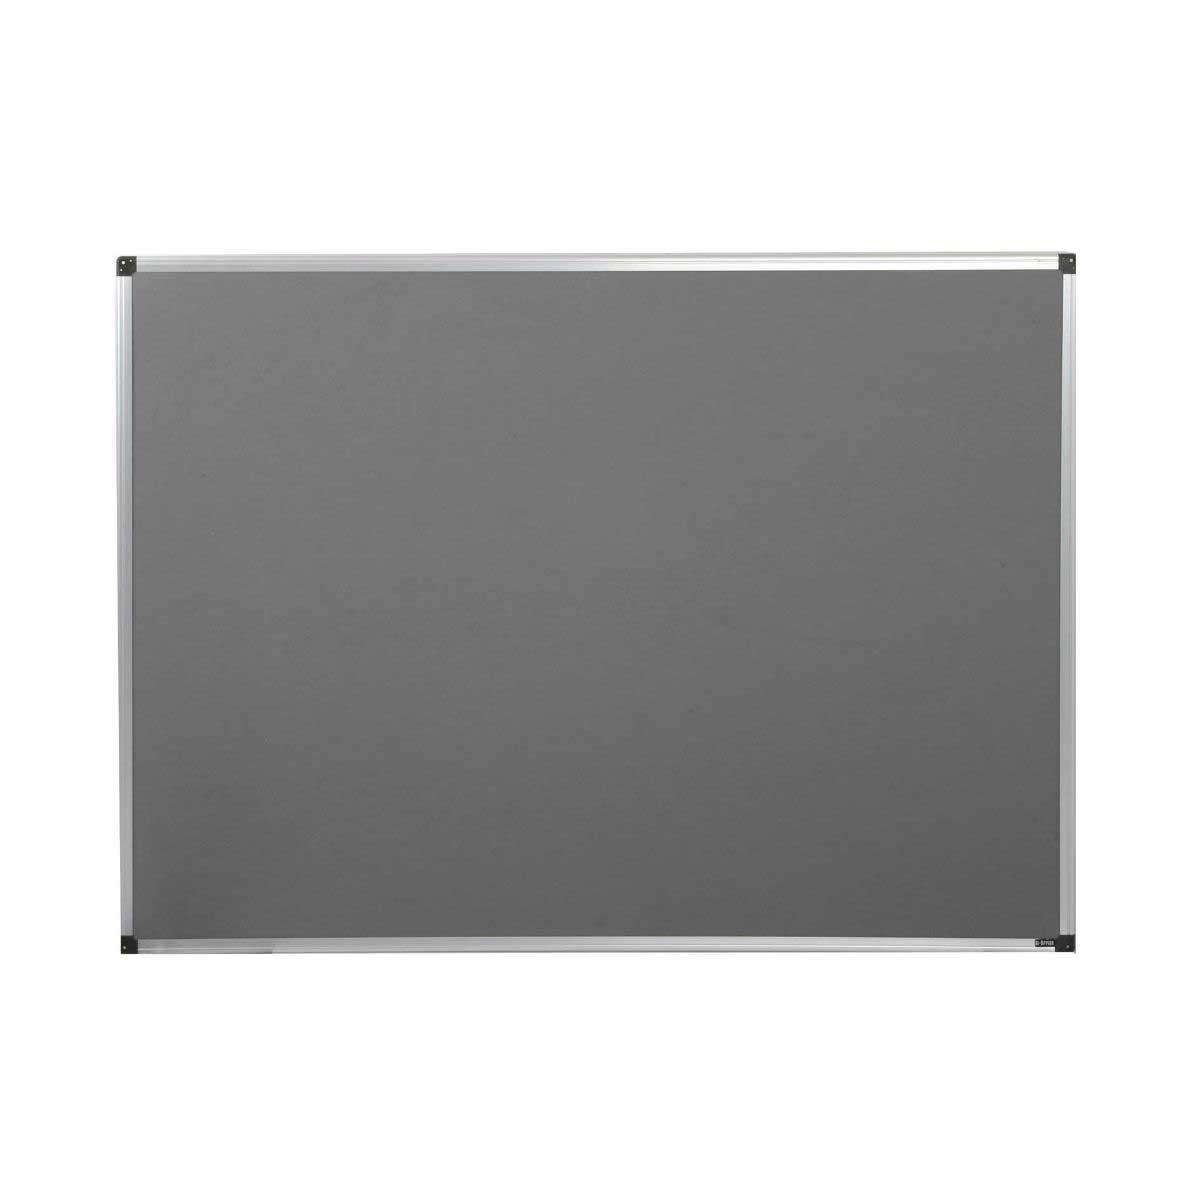 metroplan felt notice board 1200x900mm aluminium, grey